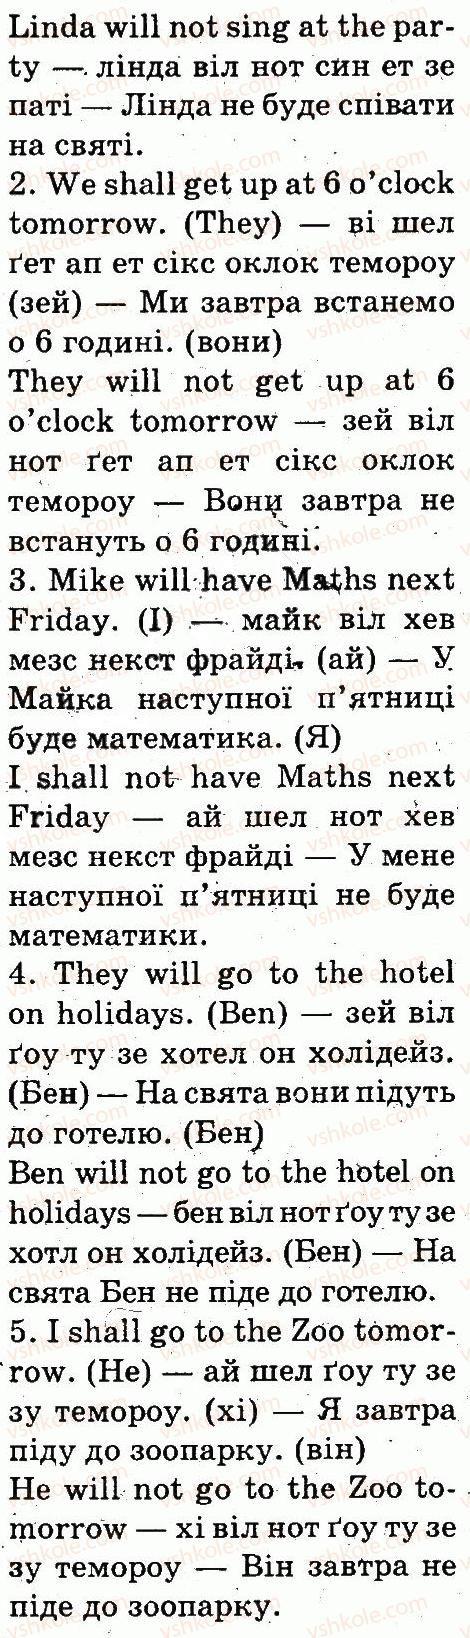 3-anglijska-mova-od-karpyuk-2013--unit-6-spring-is-here-summer-will-come-lesson-5-3-rnd8347.jpg